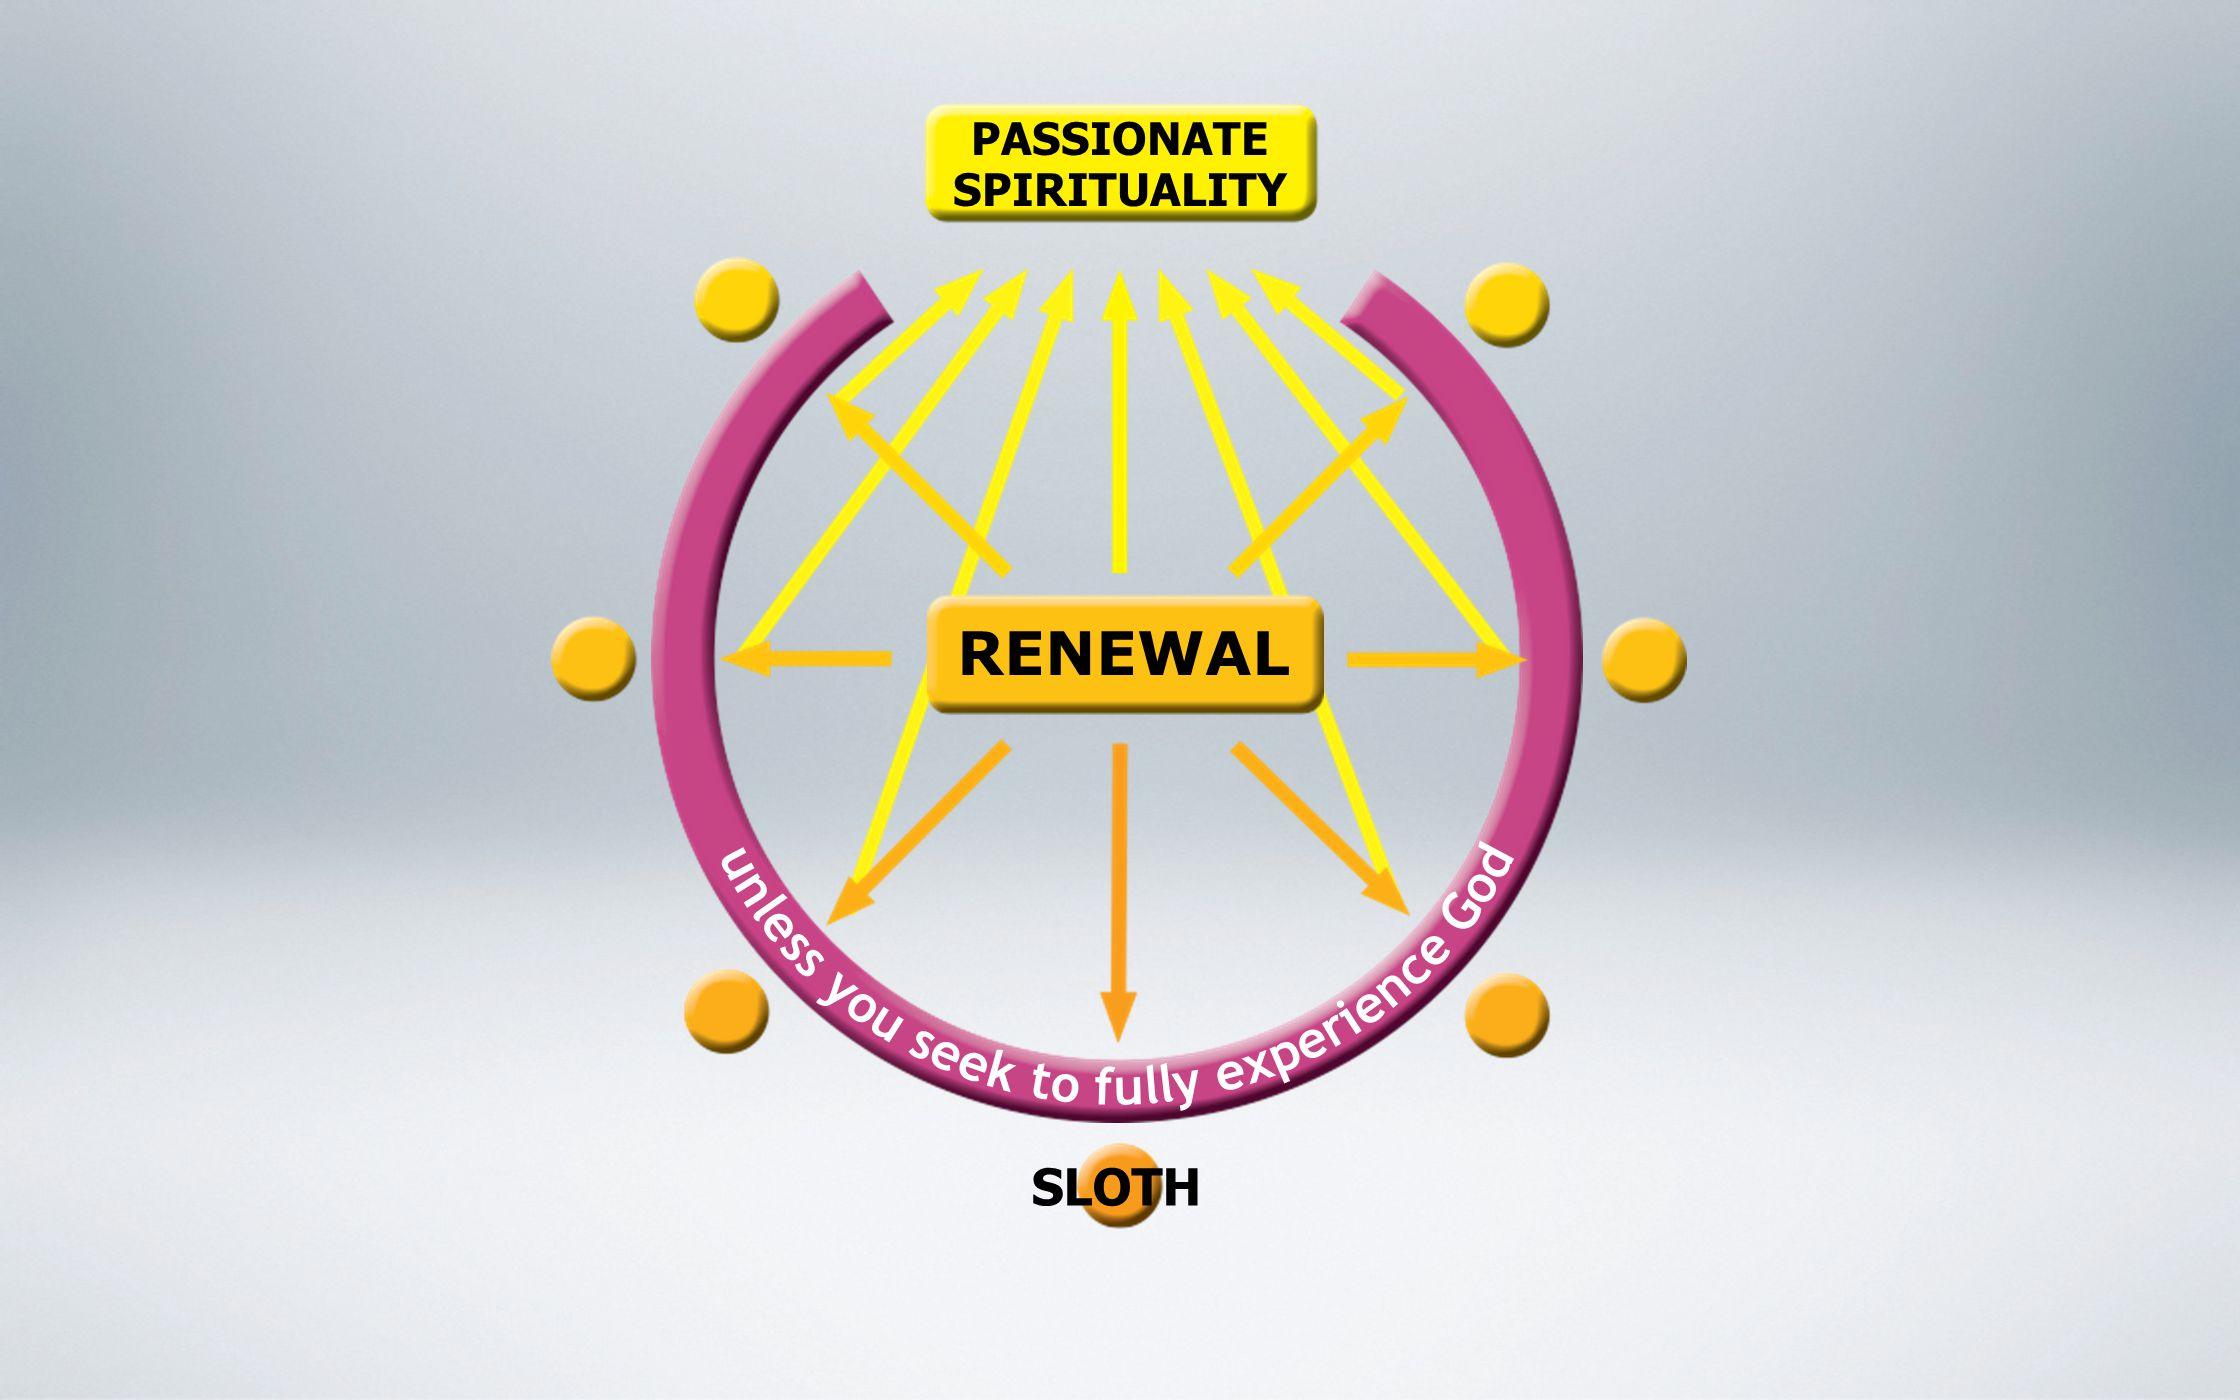 SLOTH PASSIONATE SPIRITUALITY